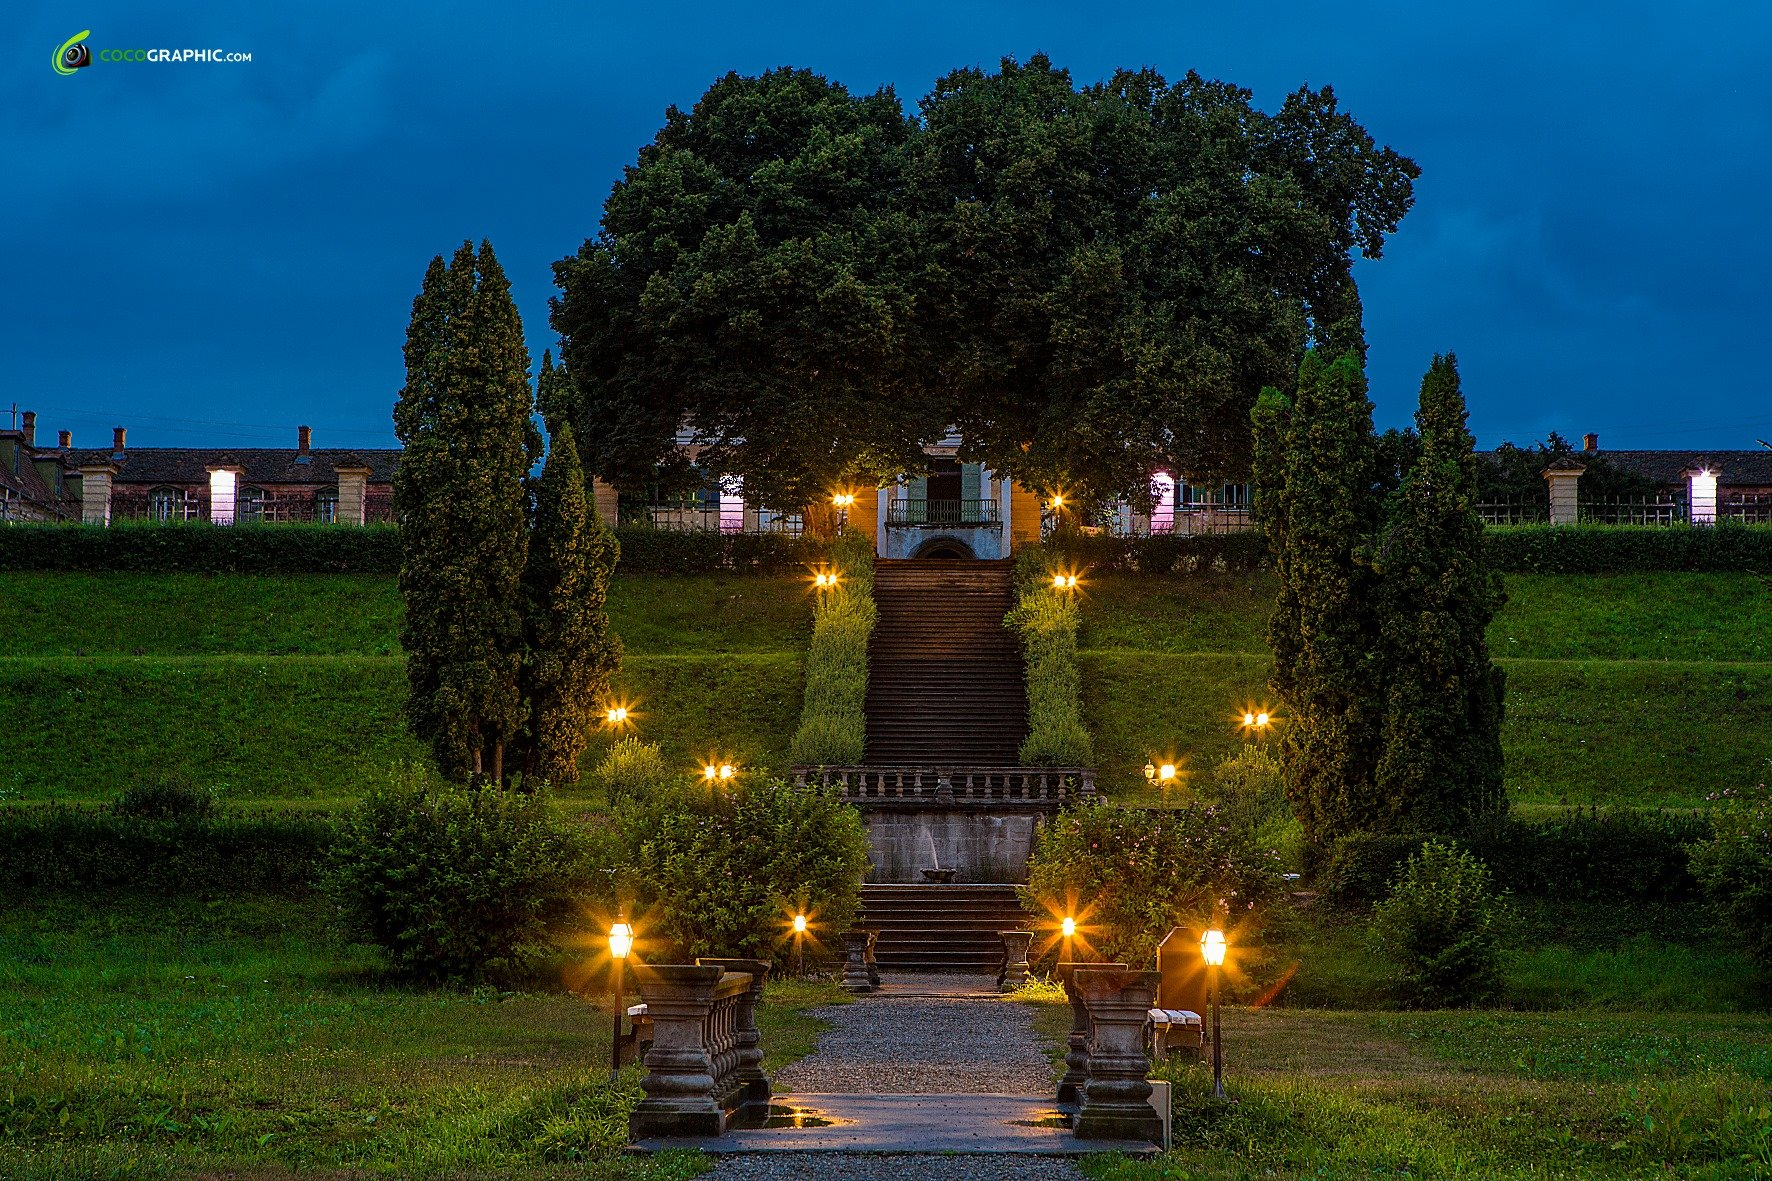 cazare palat transilvania